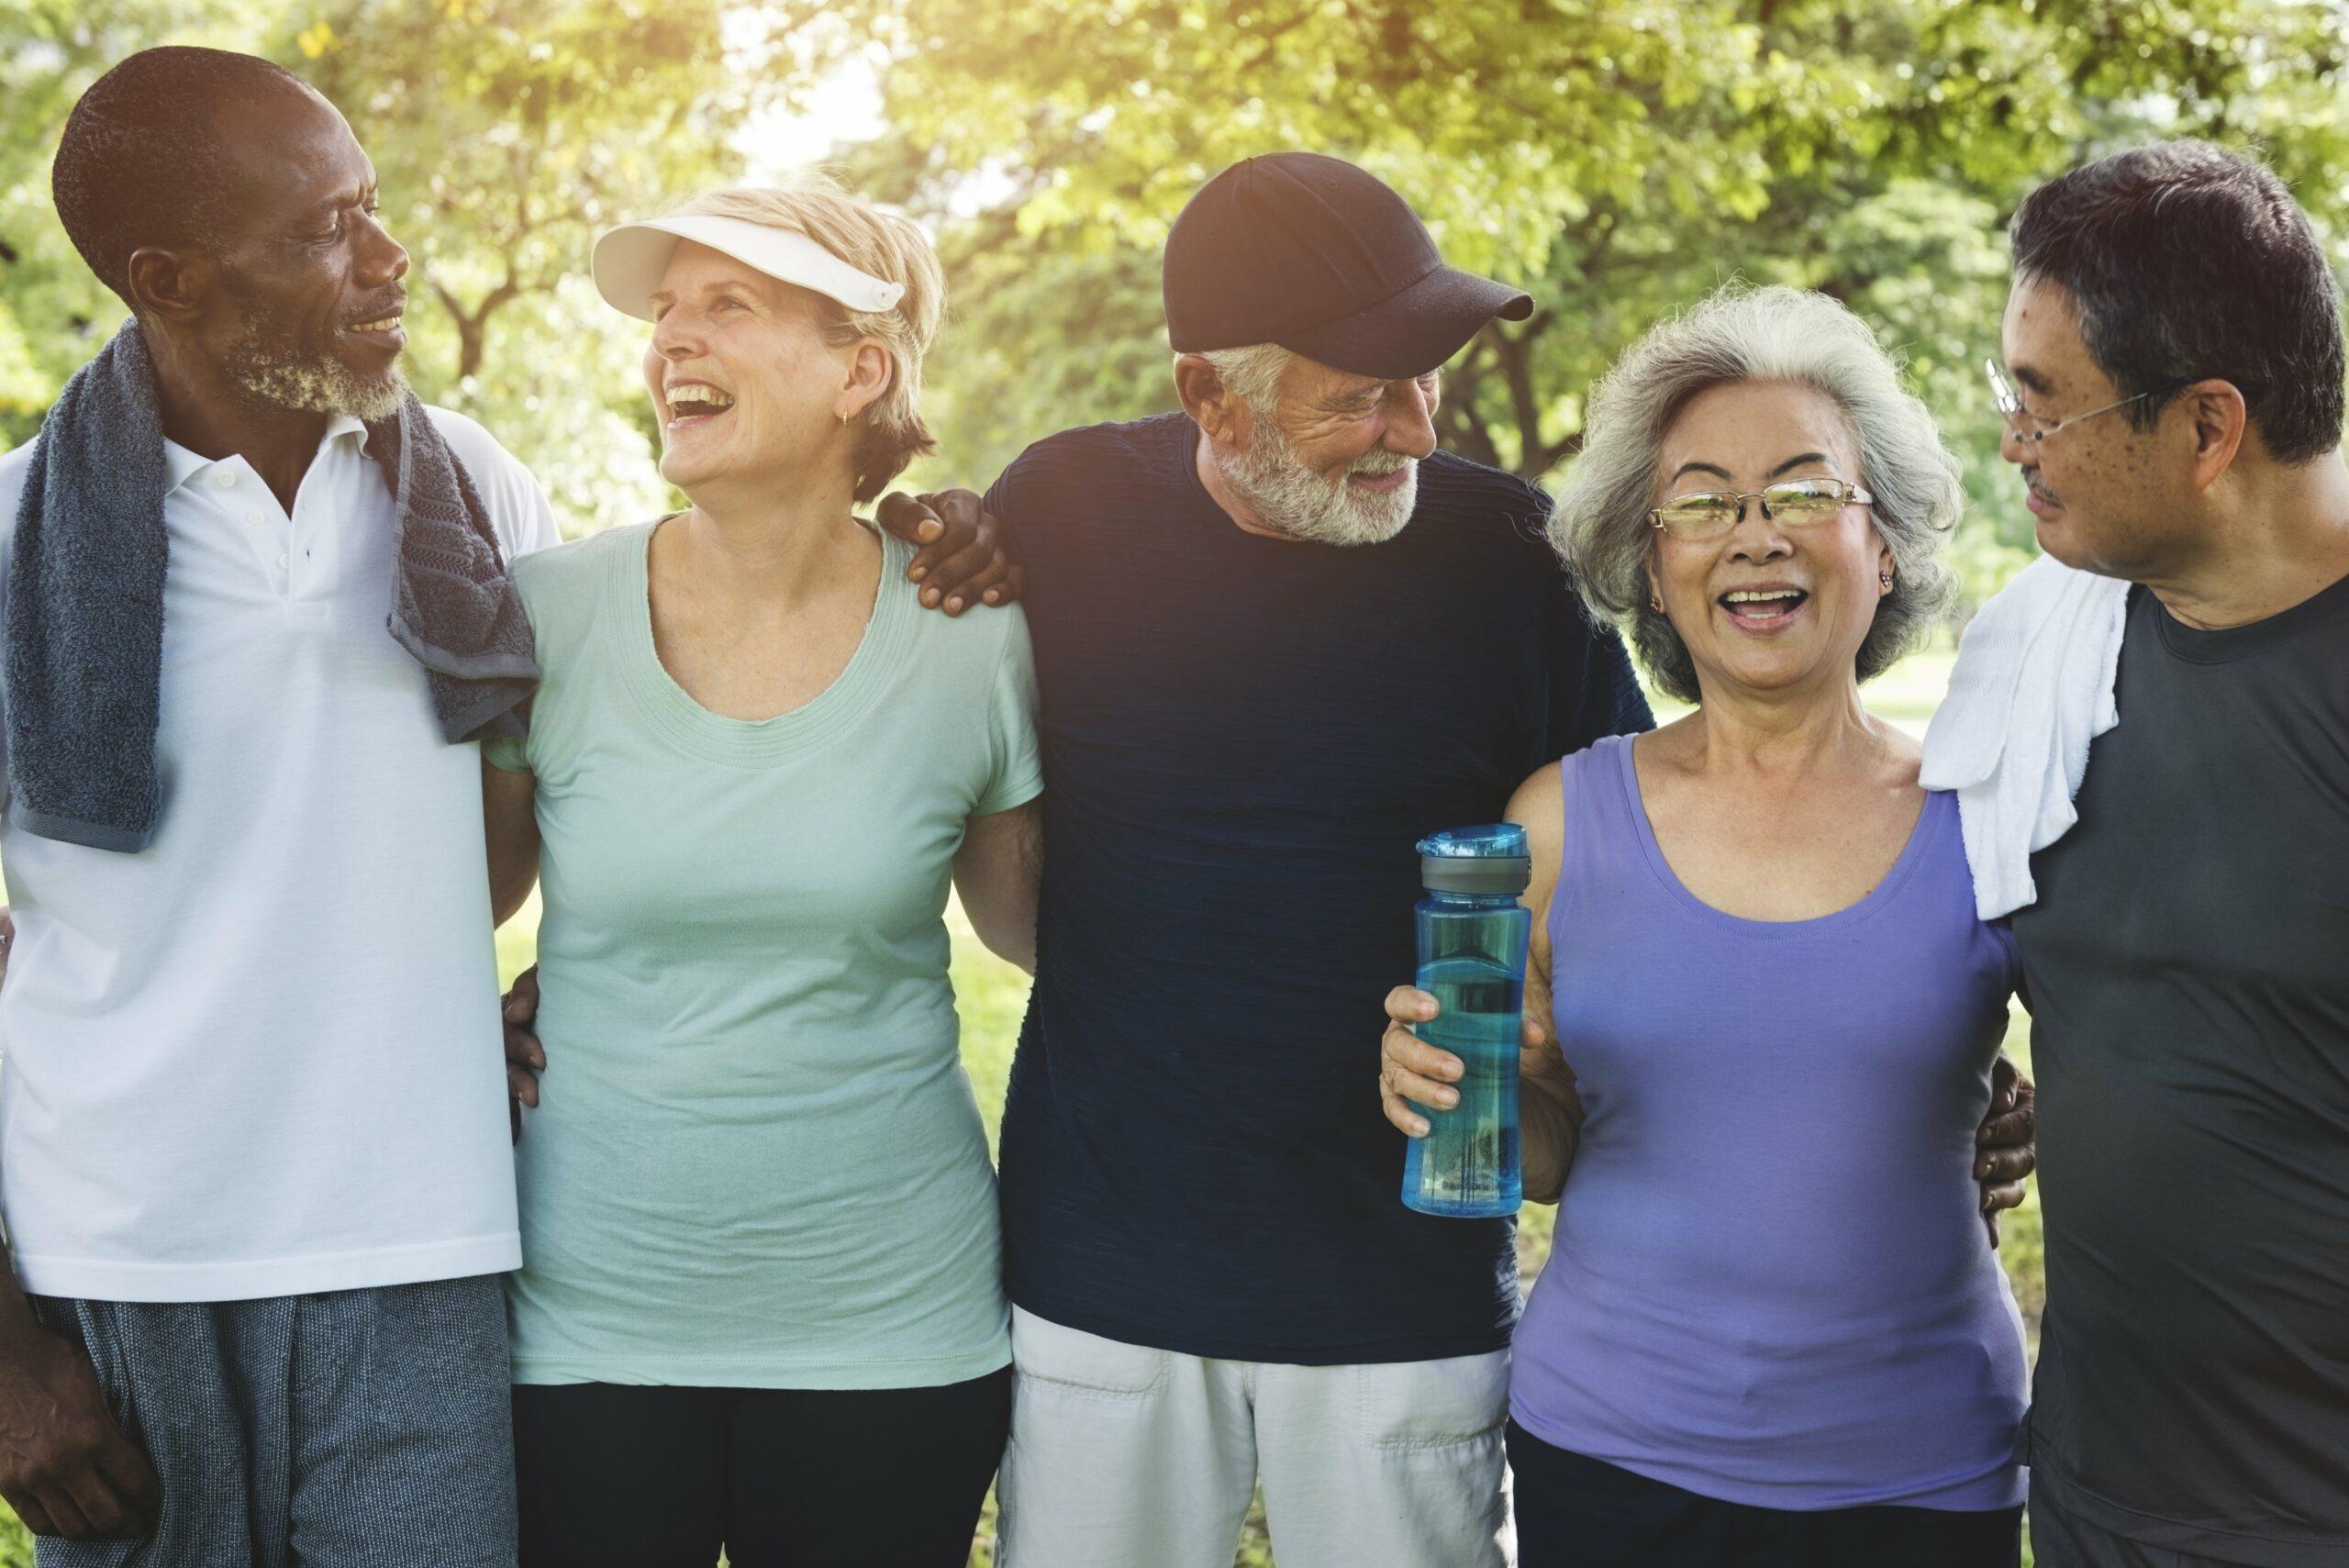 Healthy senior citizens on a walk